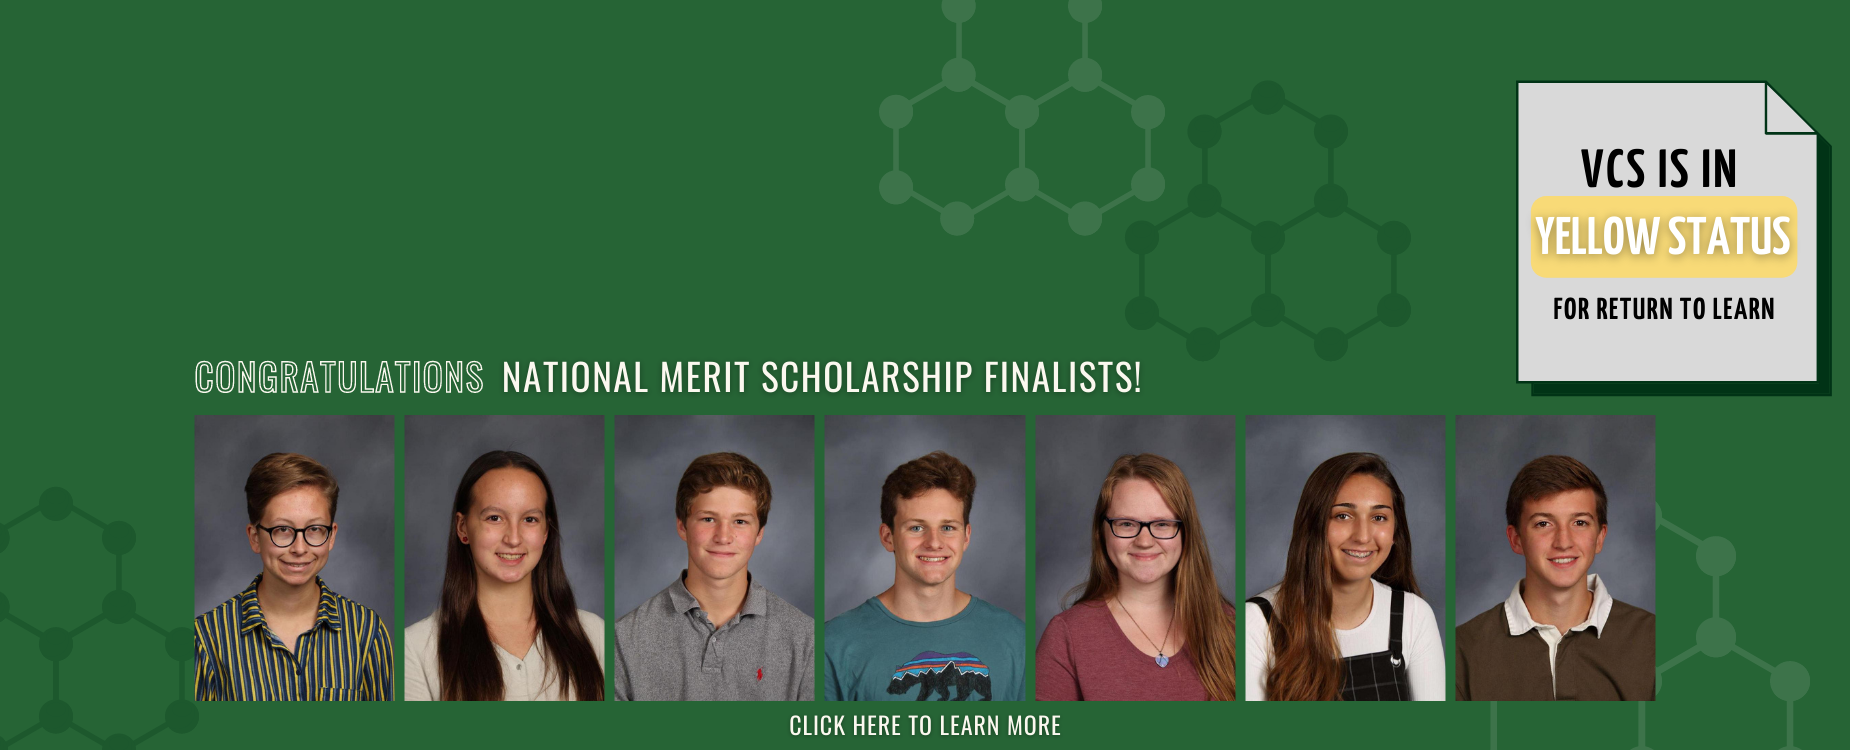 Congratulations National Merit Scholarship Finalists!